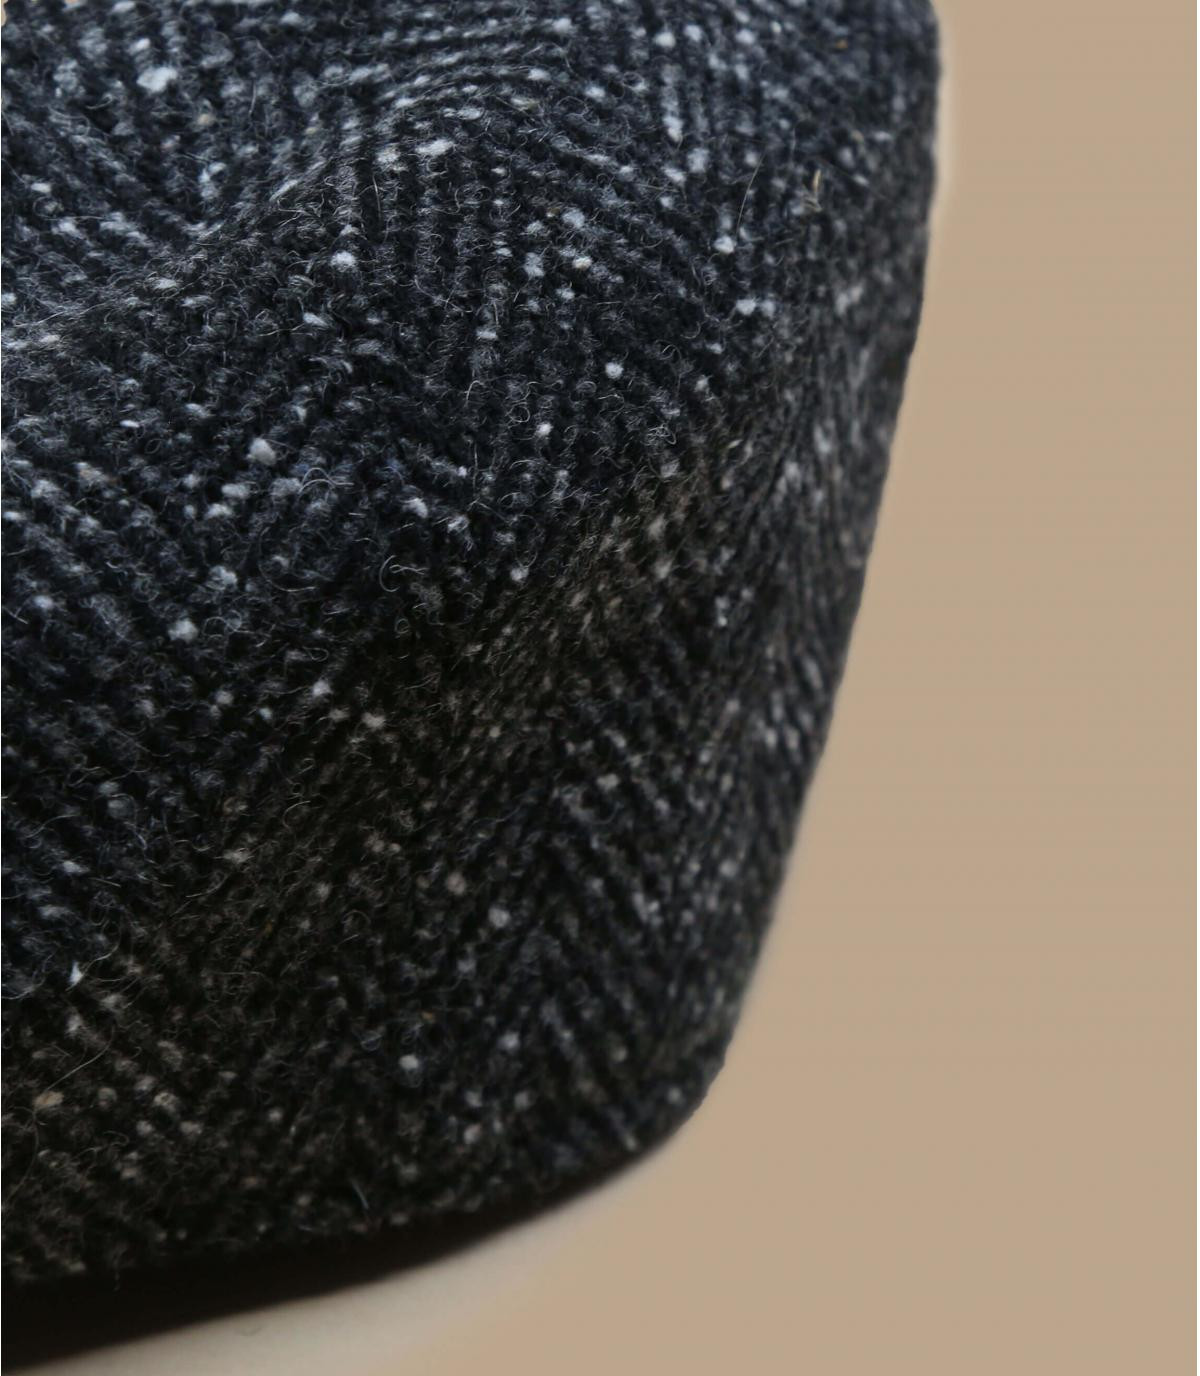 gorra repartidor negro jaspeado